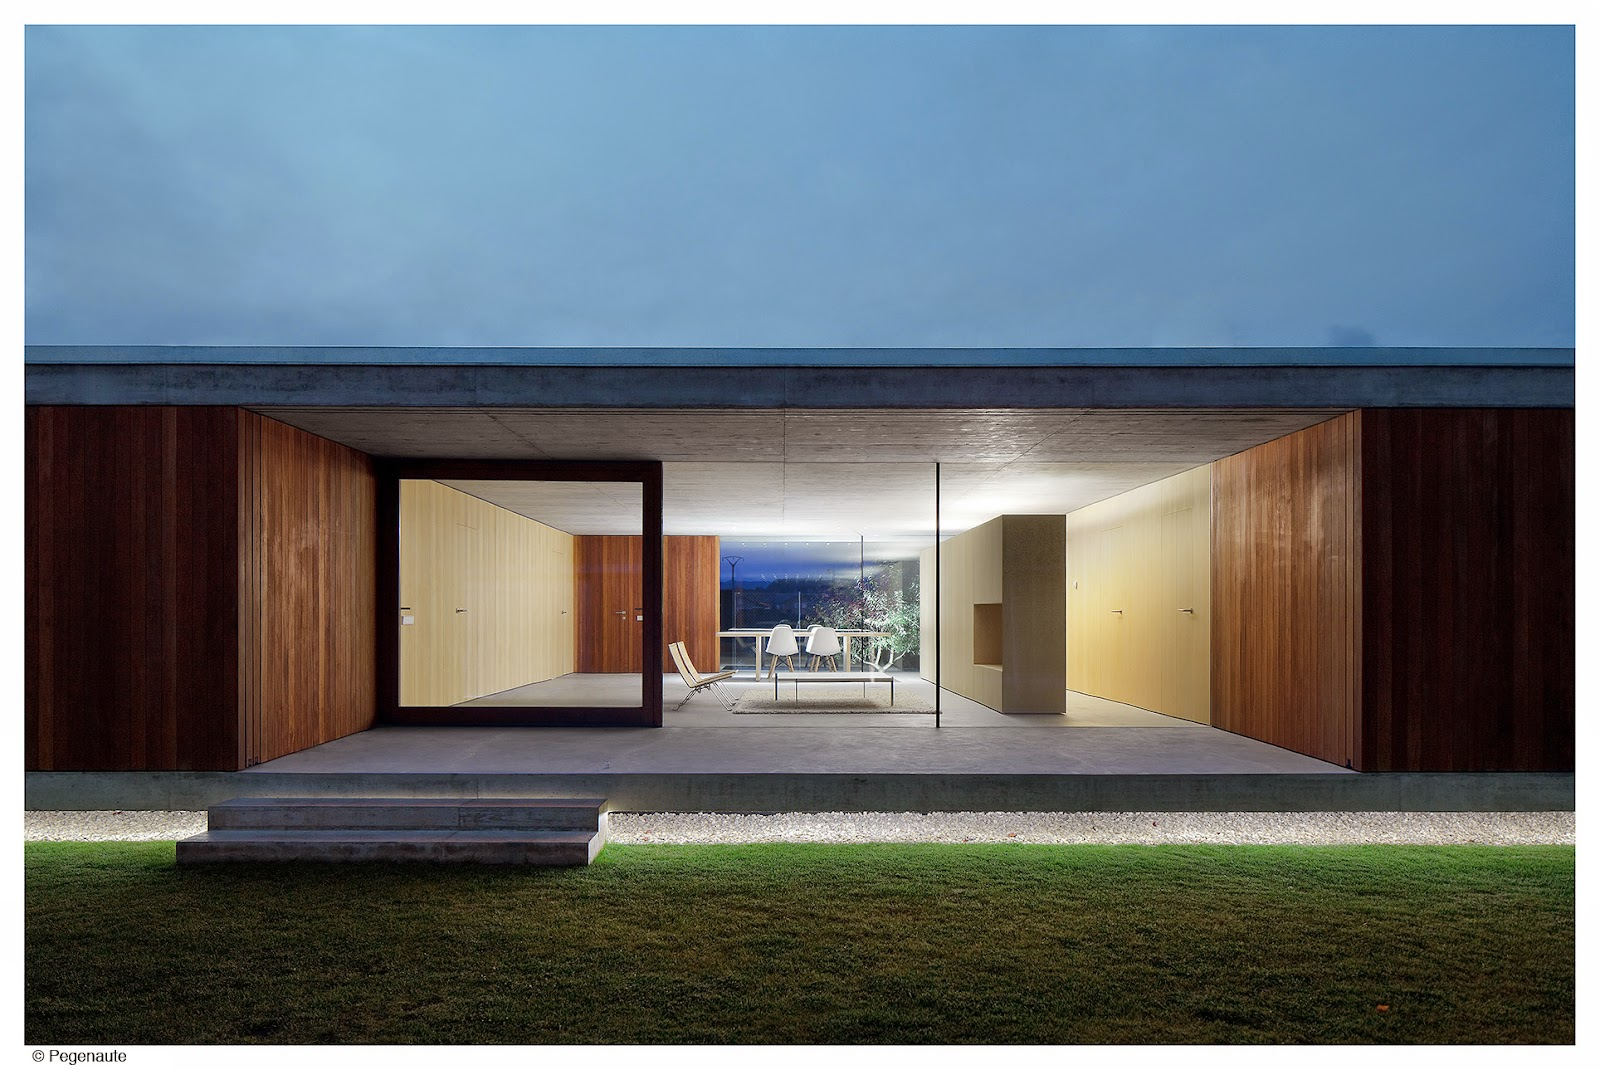 Arquitectura zona cero tras el cristal vivienda for Vivienda unifamiliar arquitectura